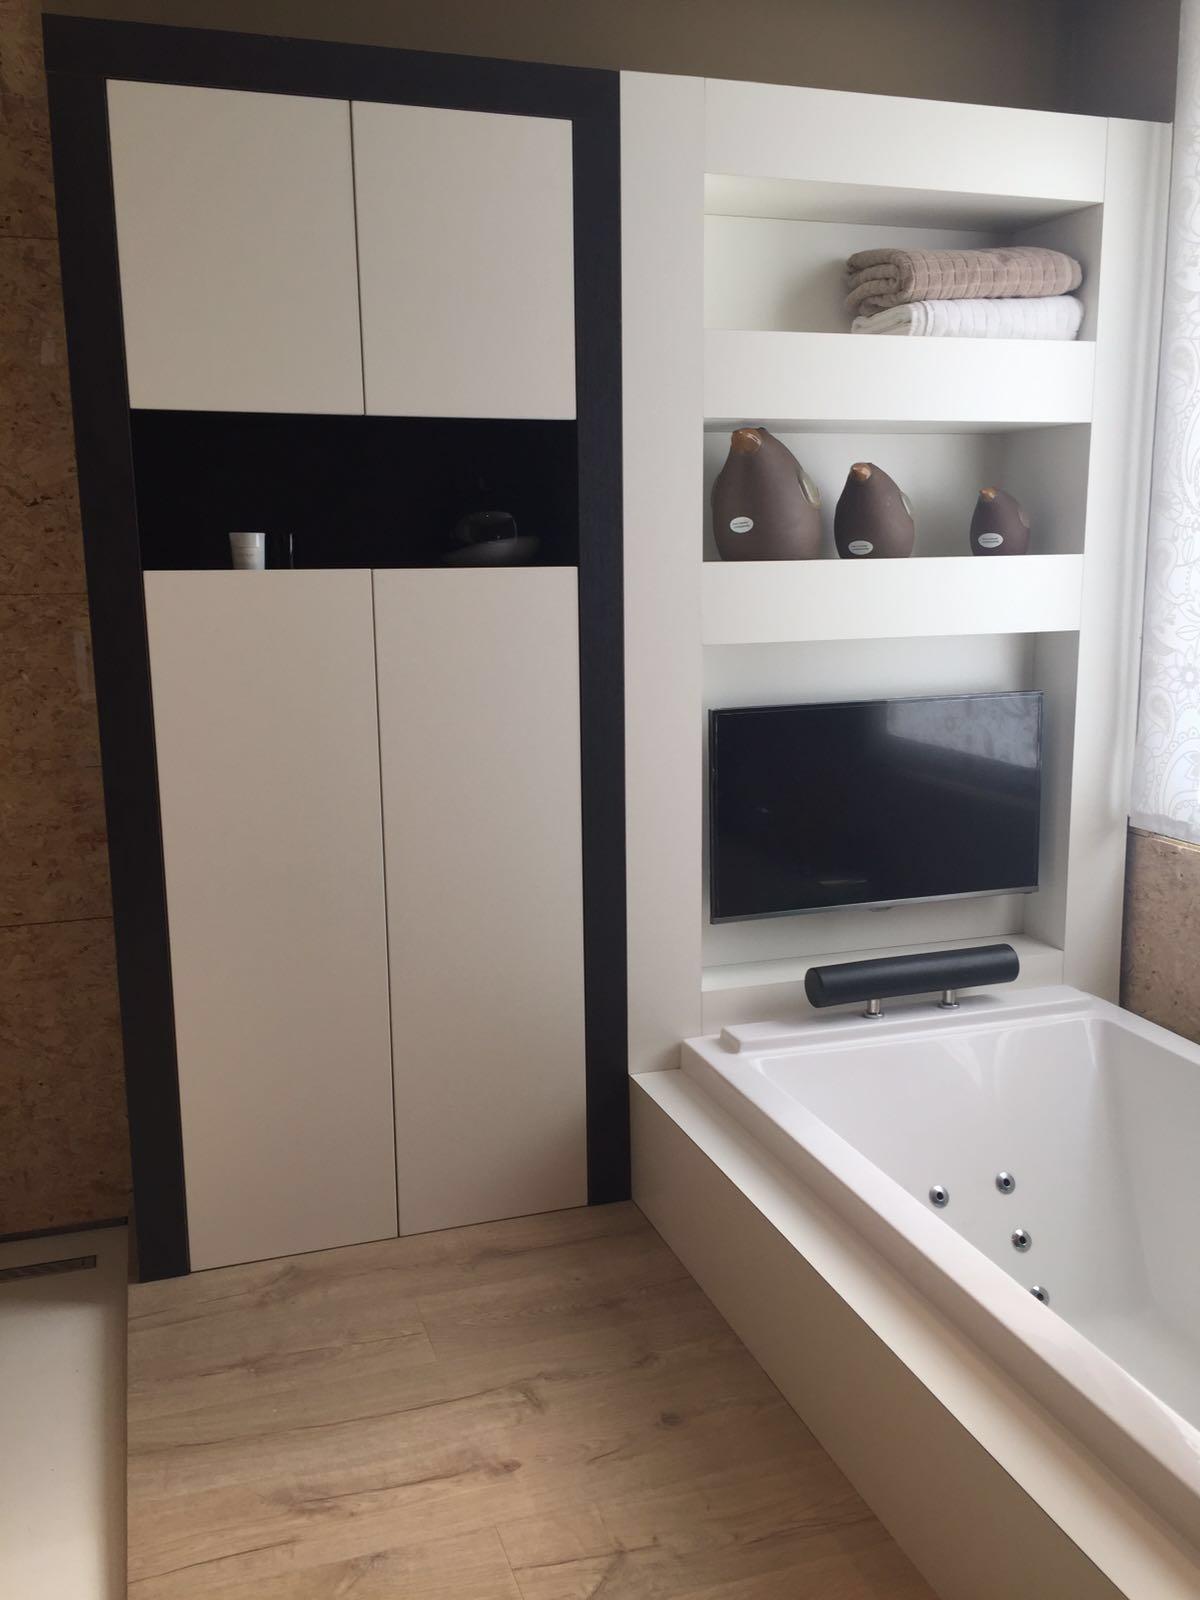 Best Kasten Badkamer Ideas - New Home Design 2018 - ummoa.us